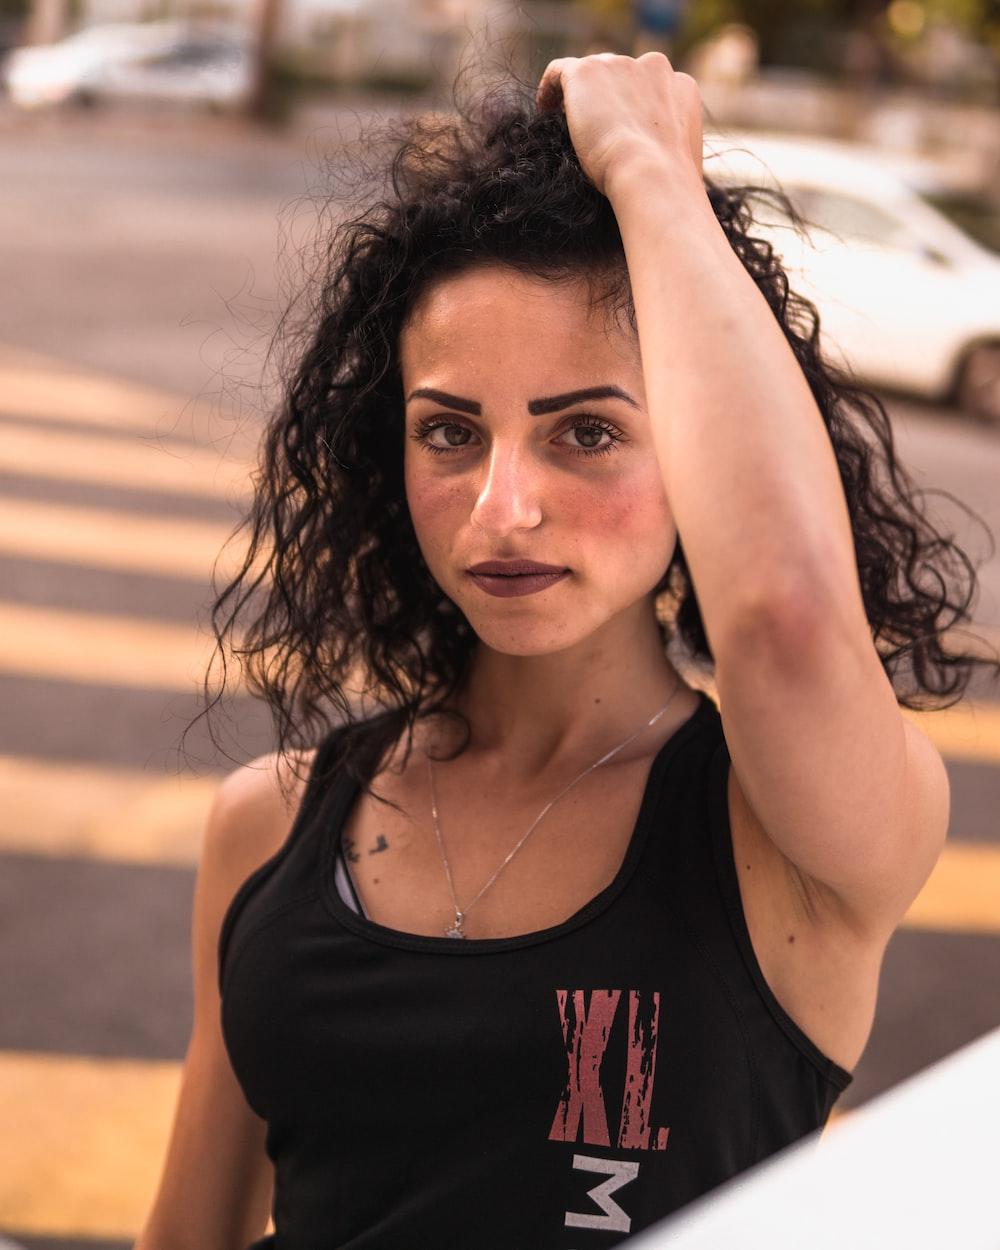 women wearing a black tank top close-up photography